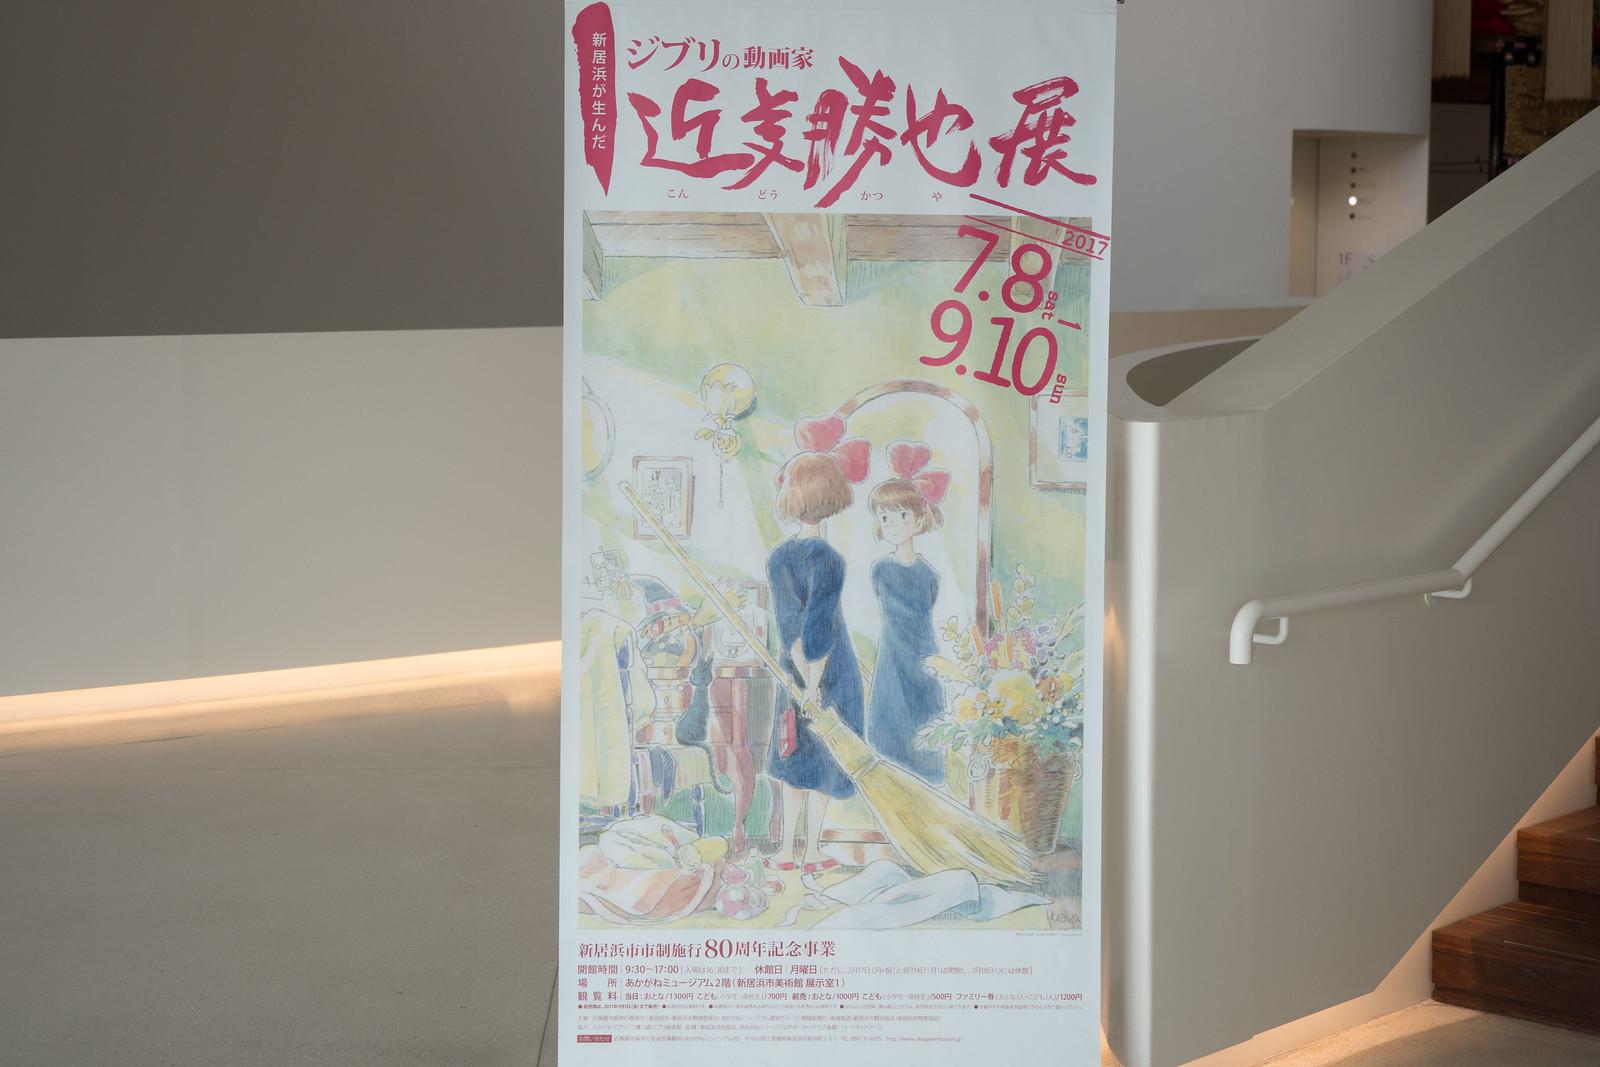 Ghibli_katsuyakondo-5